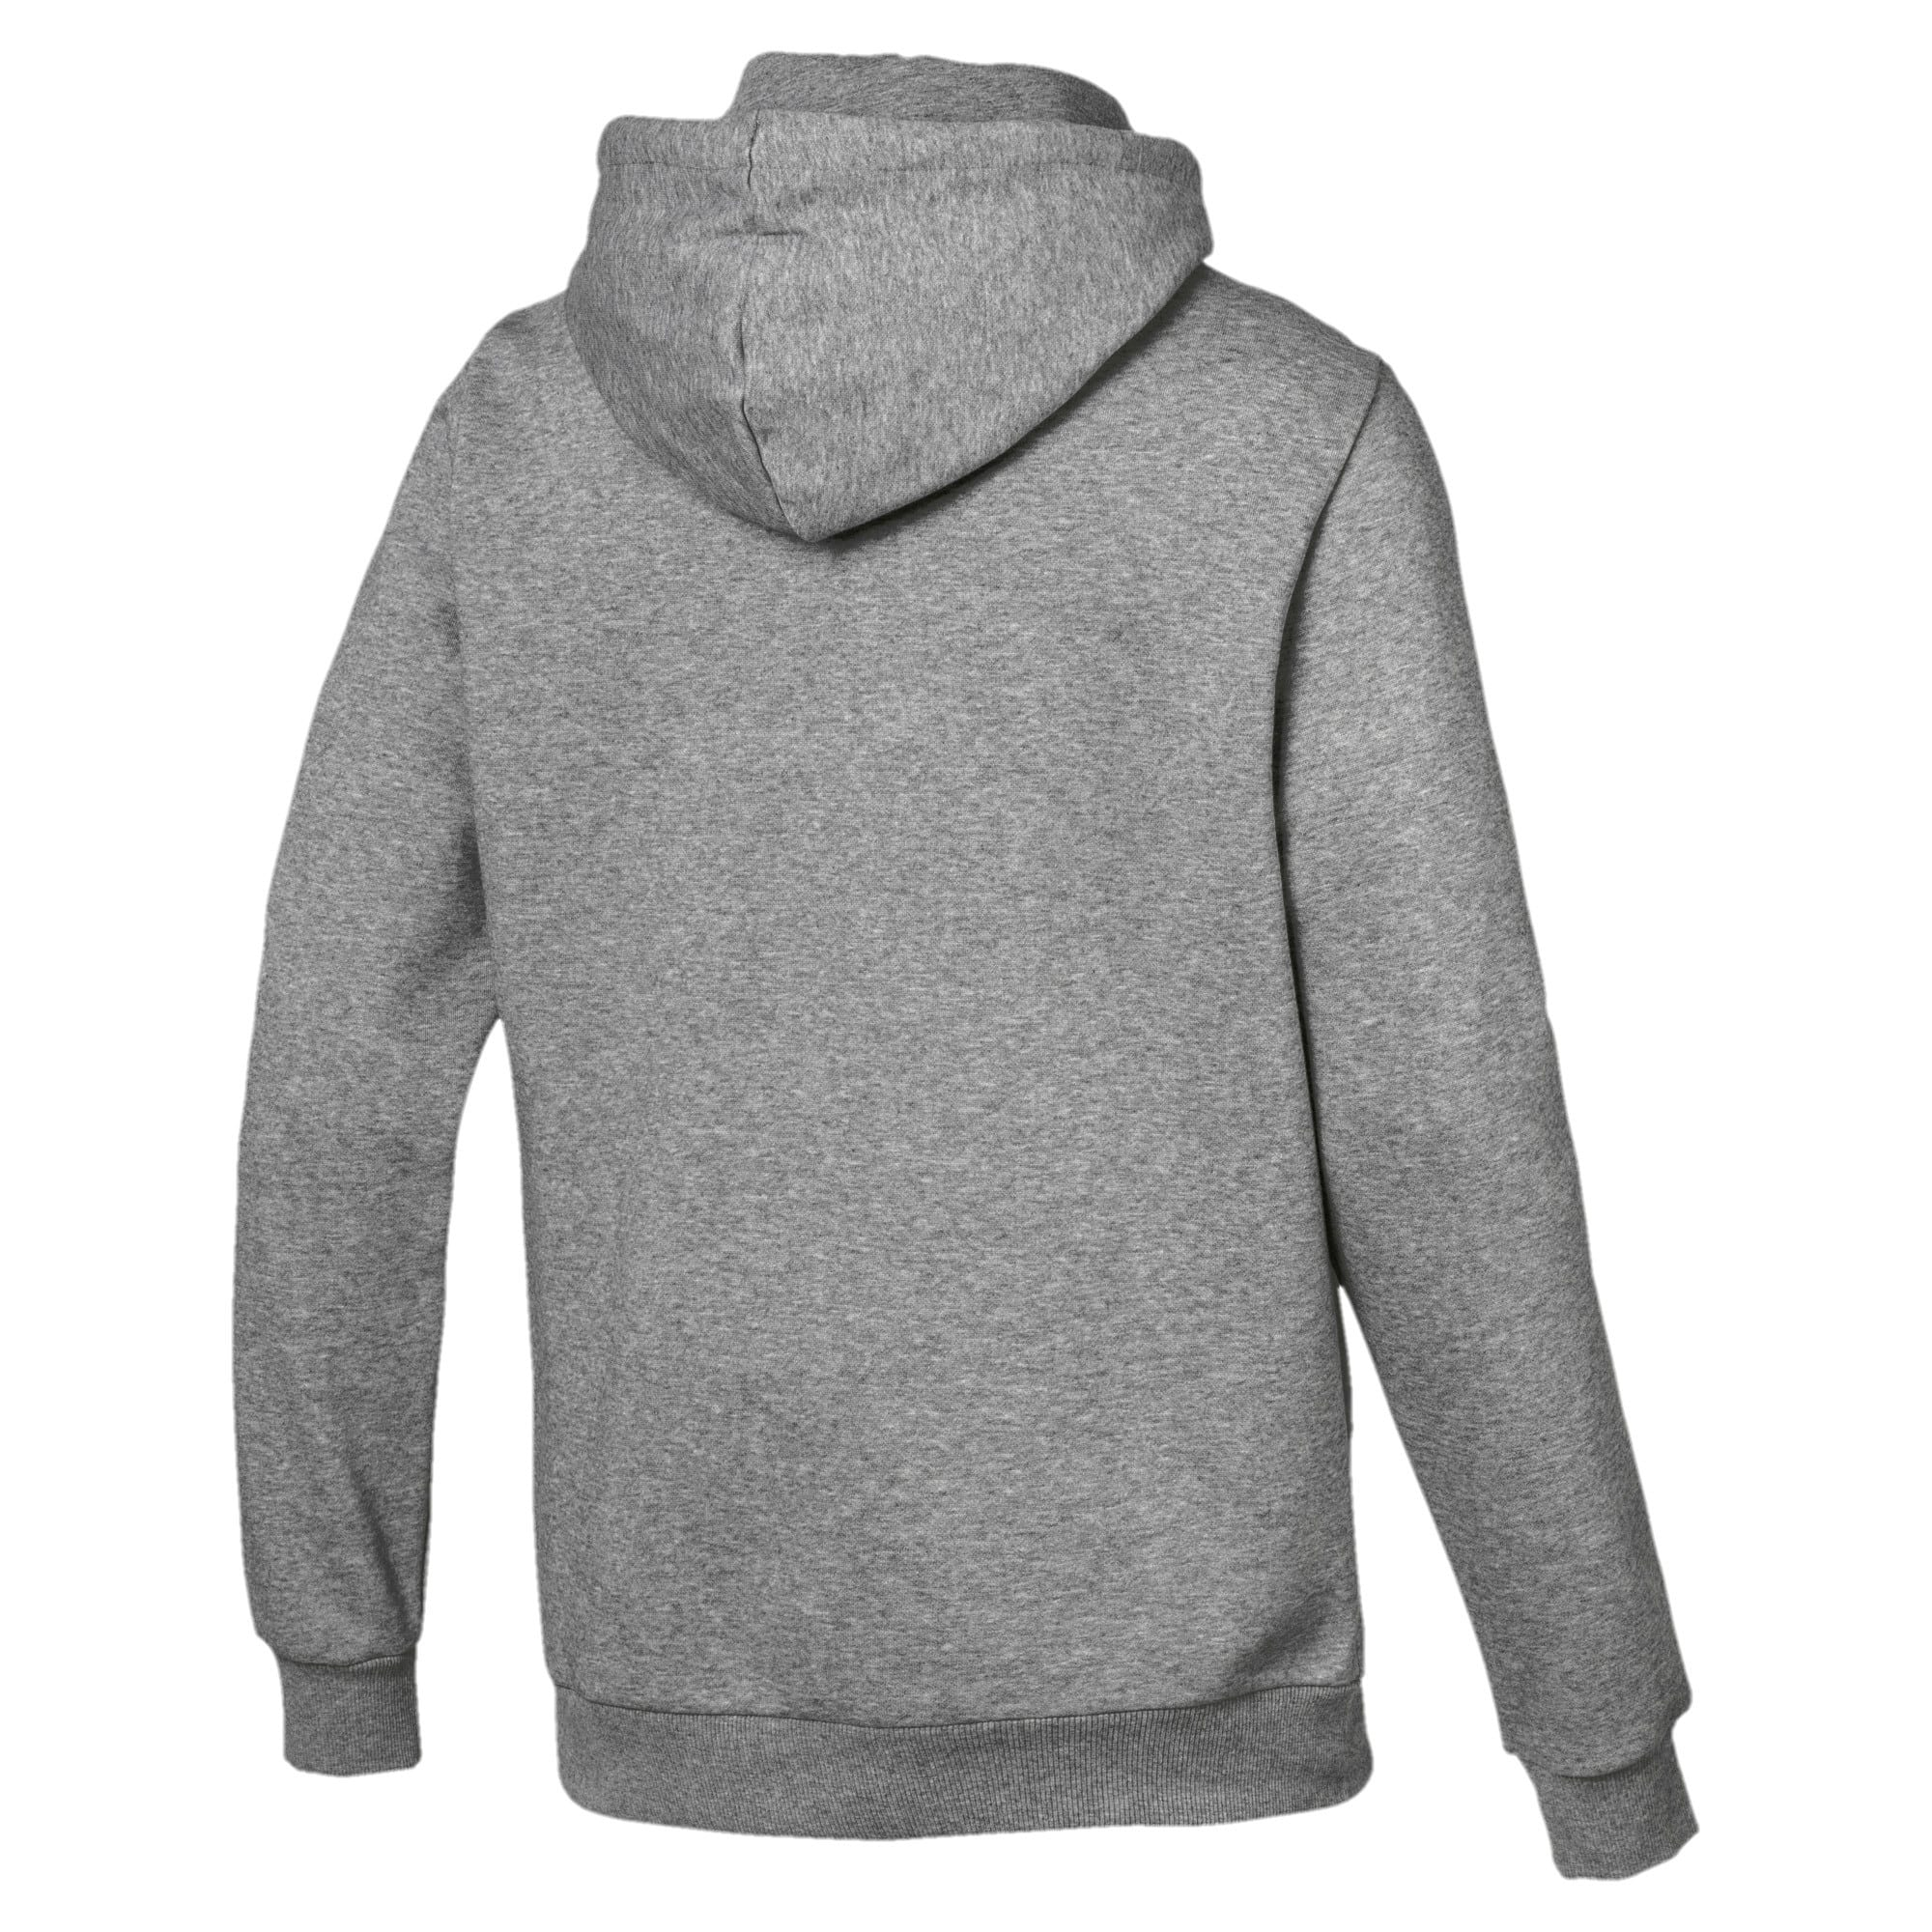 Thumbnail 3 of Essentials Men's Fleece Hoodie, Medium Gray Heather, medium